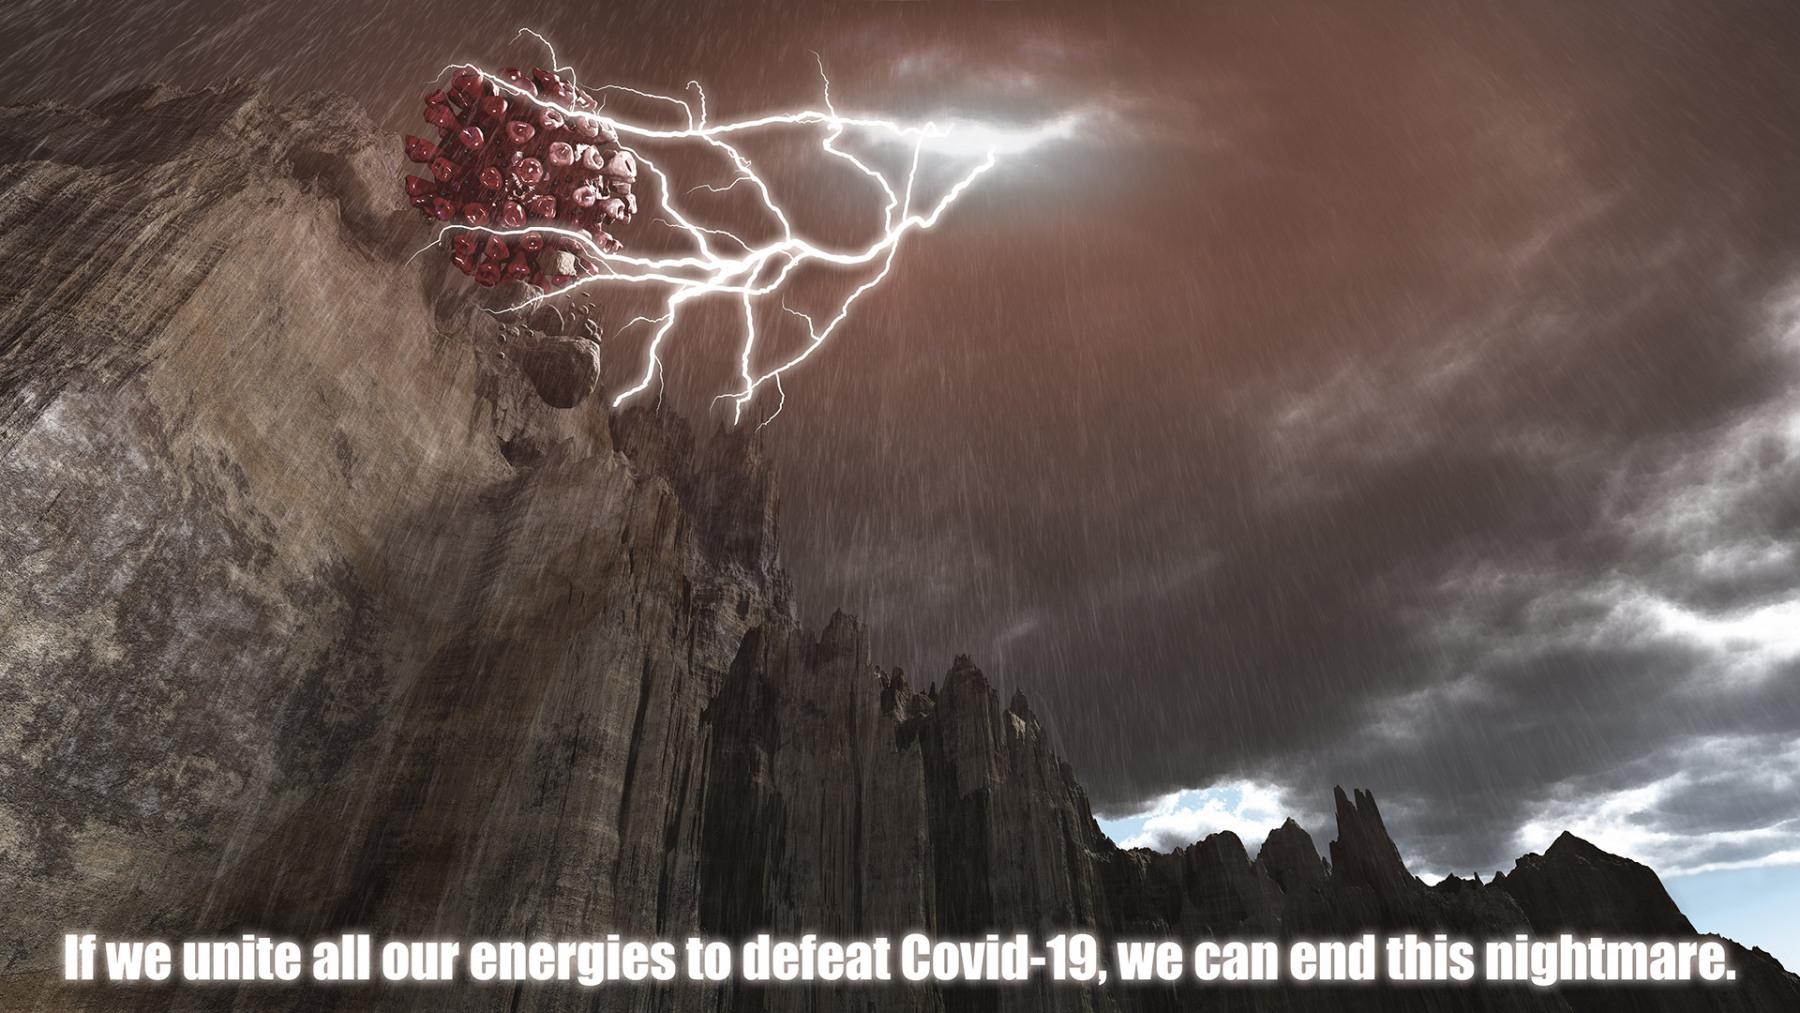 ENDING COVID-19